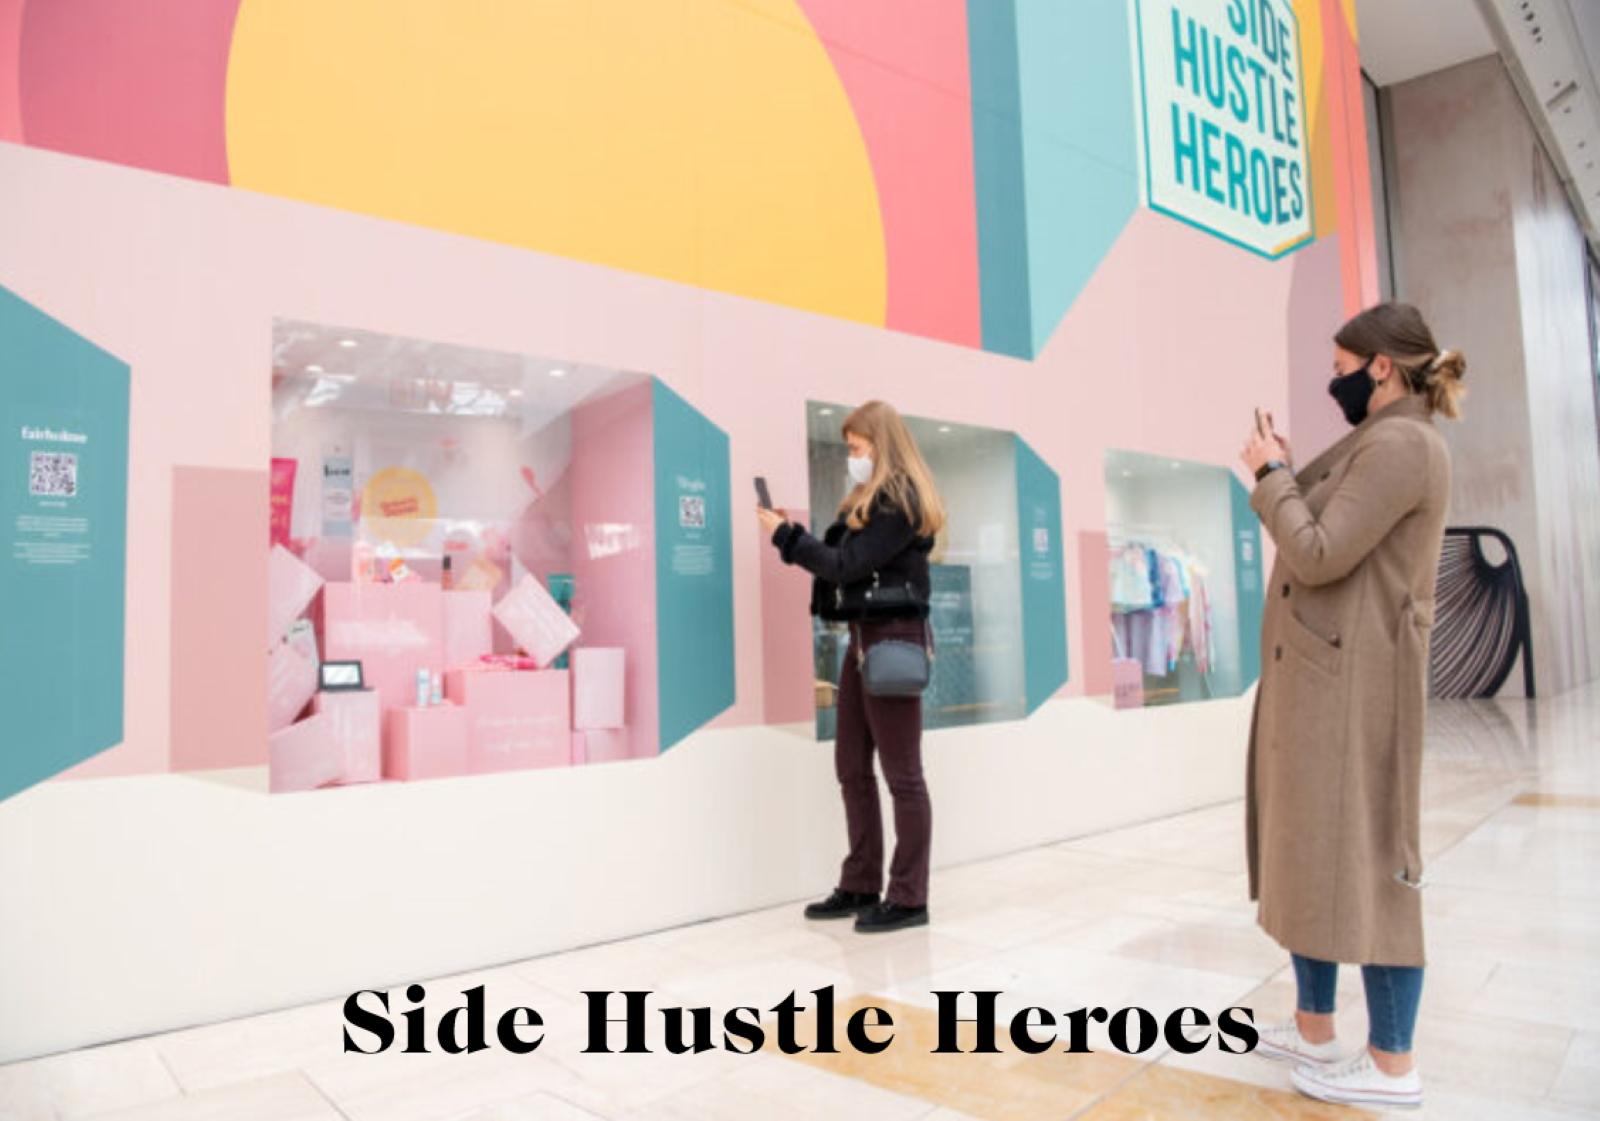 Side hustle heroes innovation tour missions mmm 0